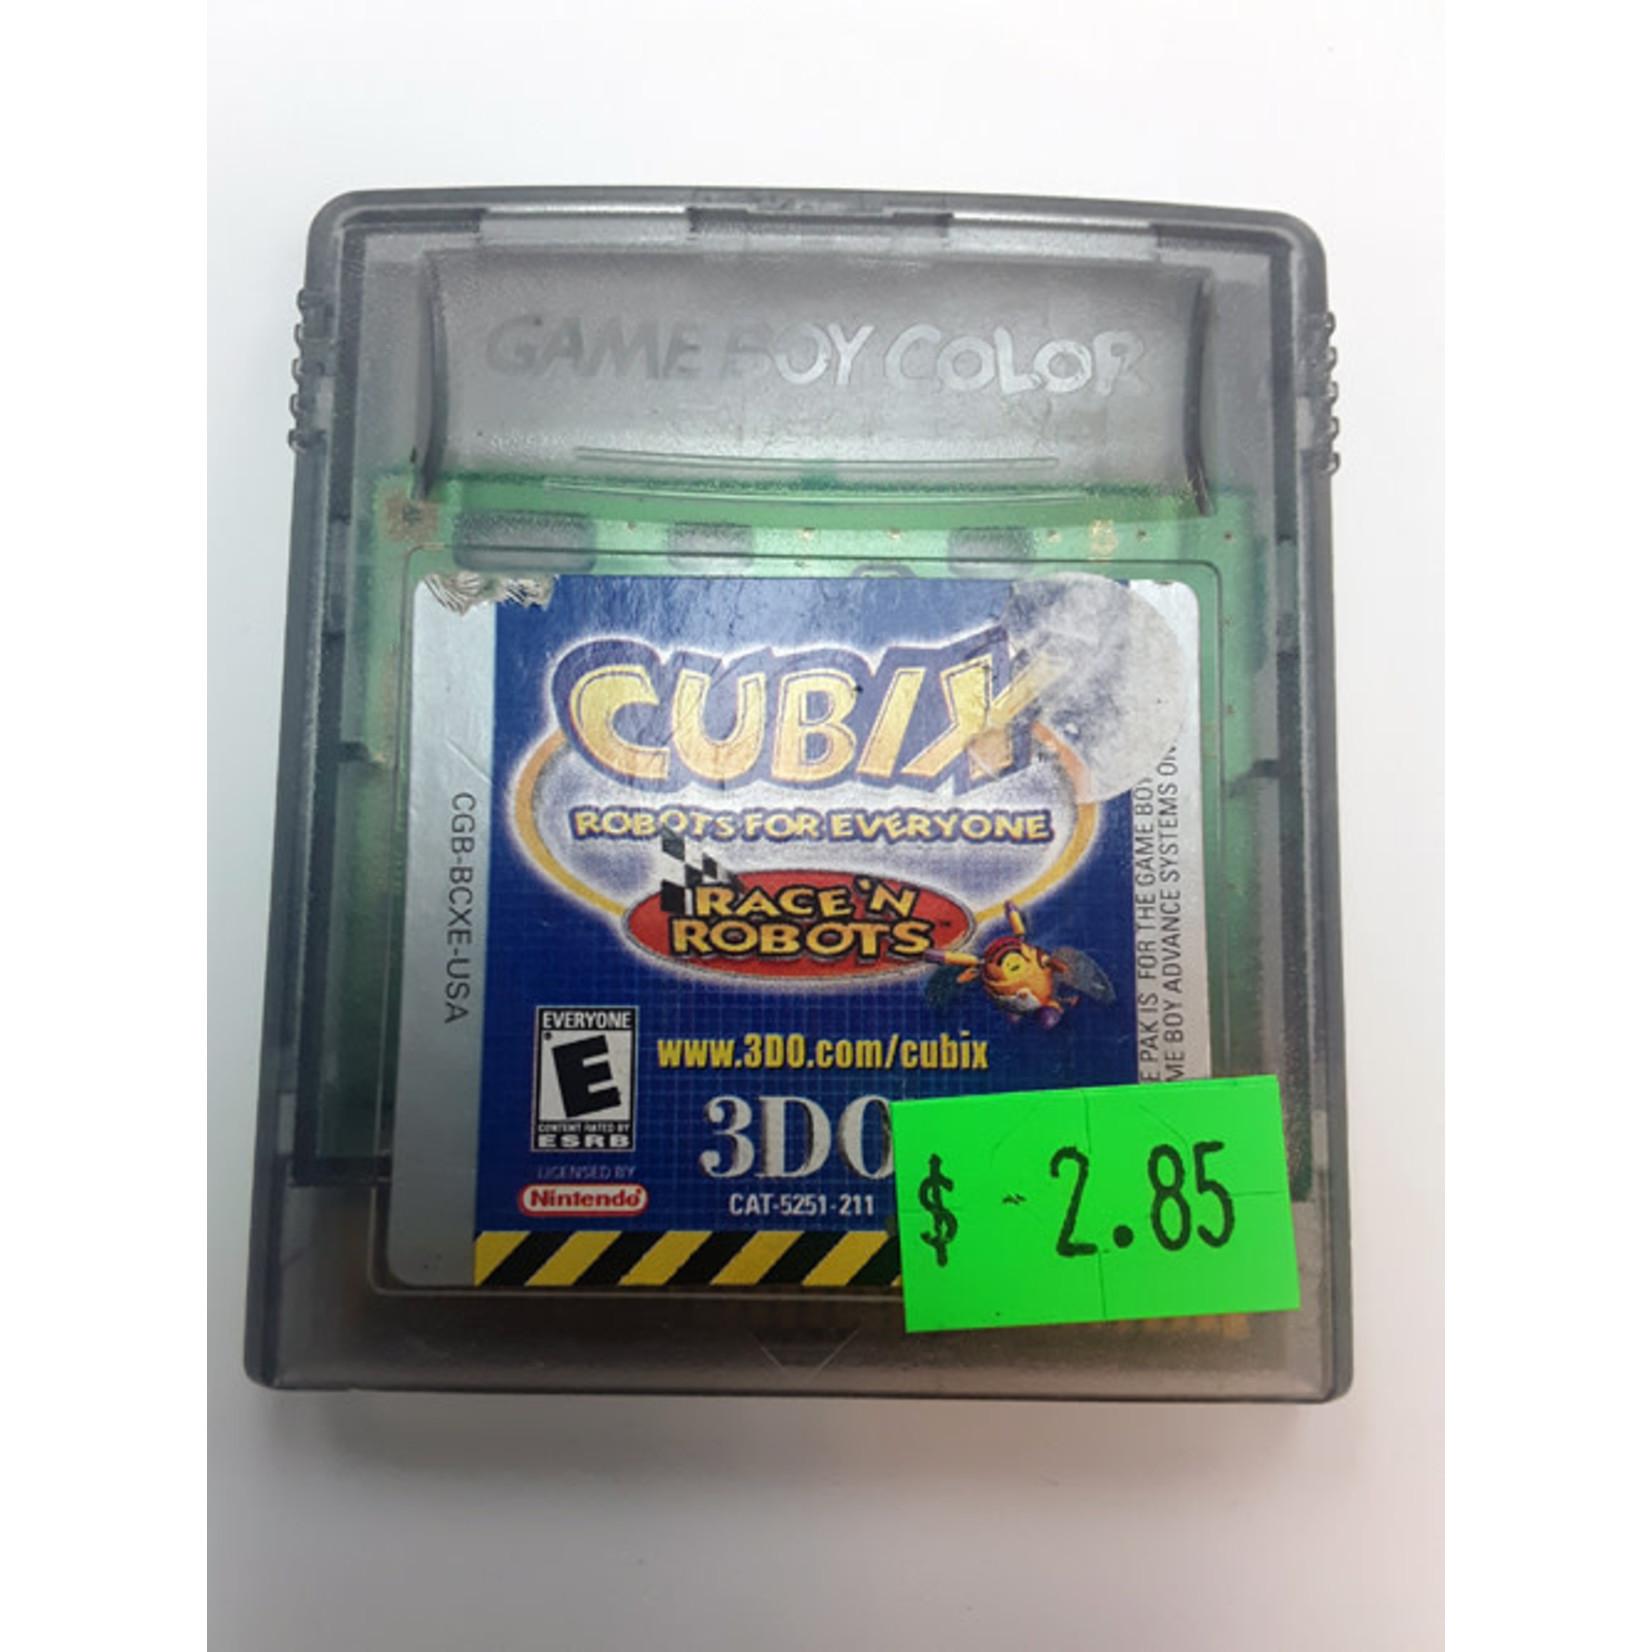 GBCU-Cubix robots for everyone race (cartridge)